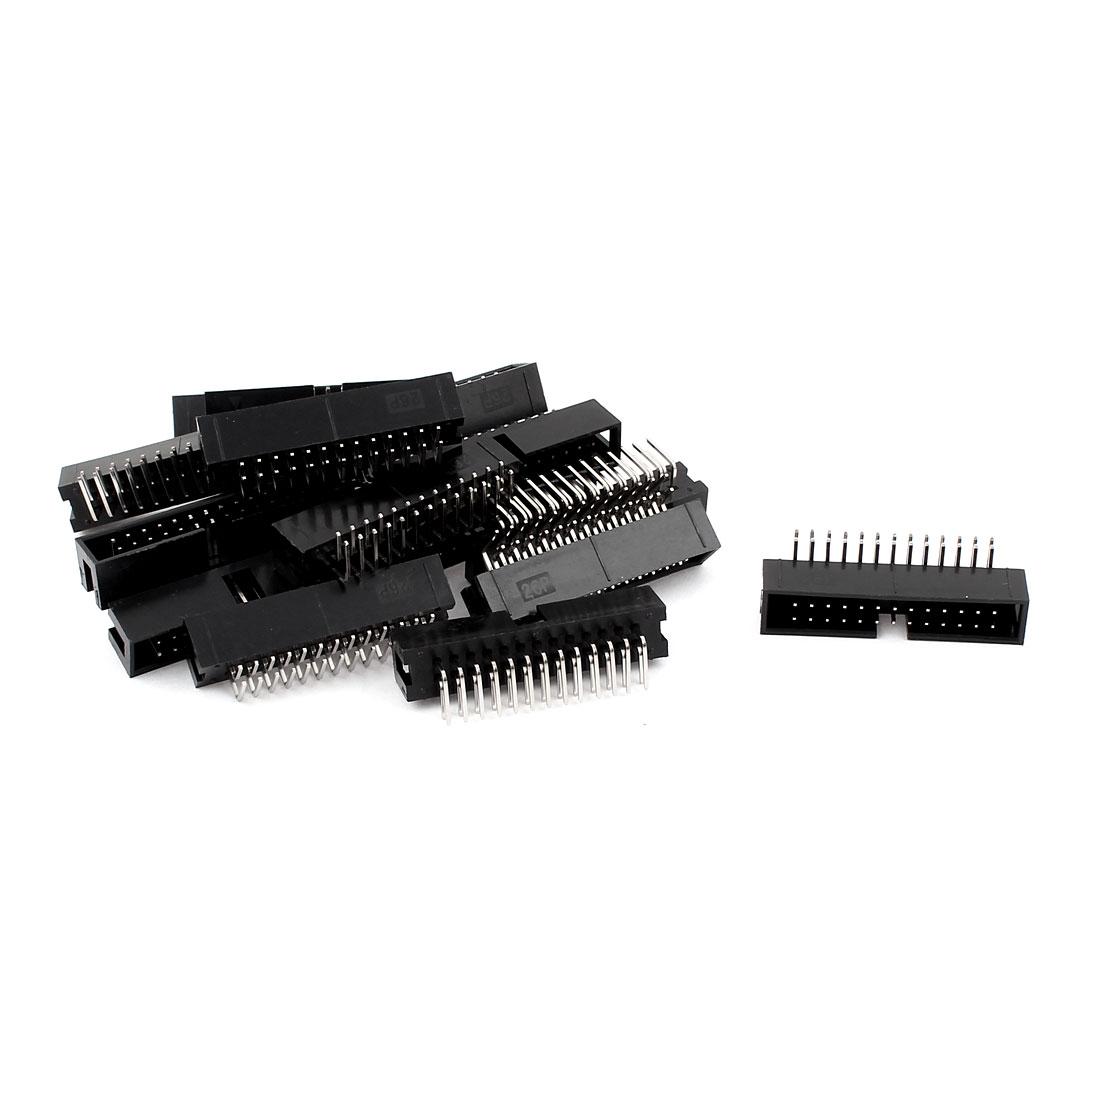 16Pcs 2x13 26-Pin Box Header Connector IDC Male Sockets Right Angle 2.54mm